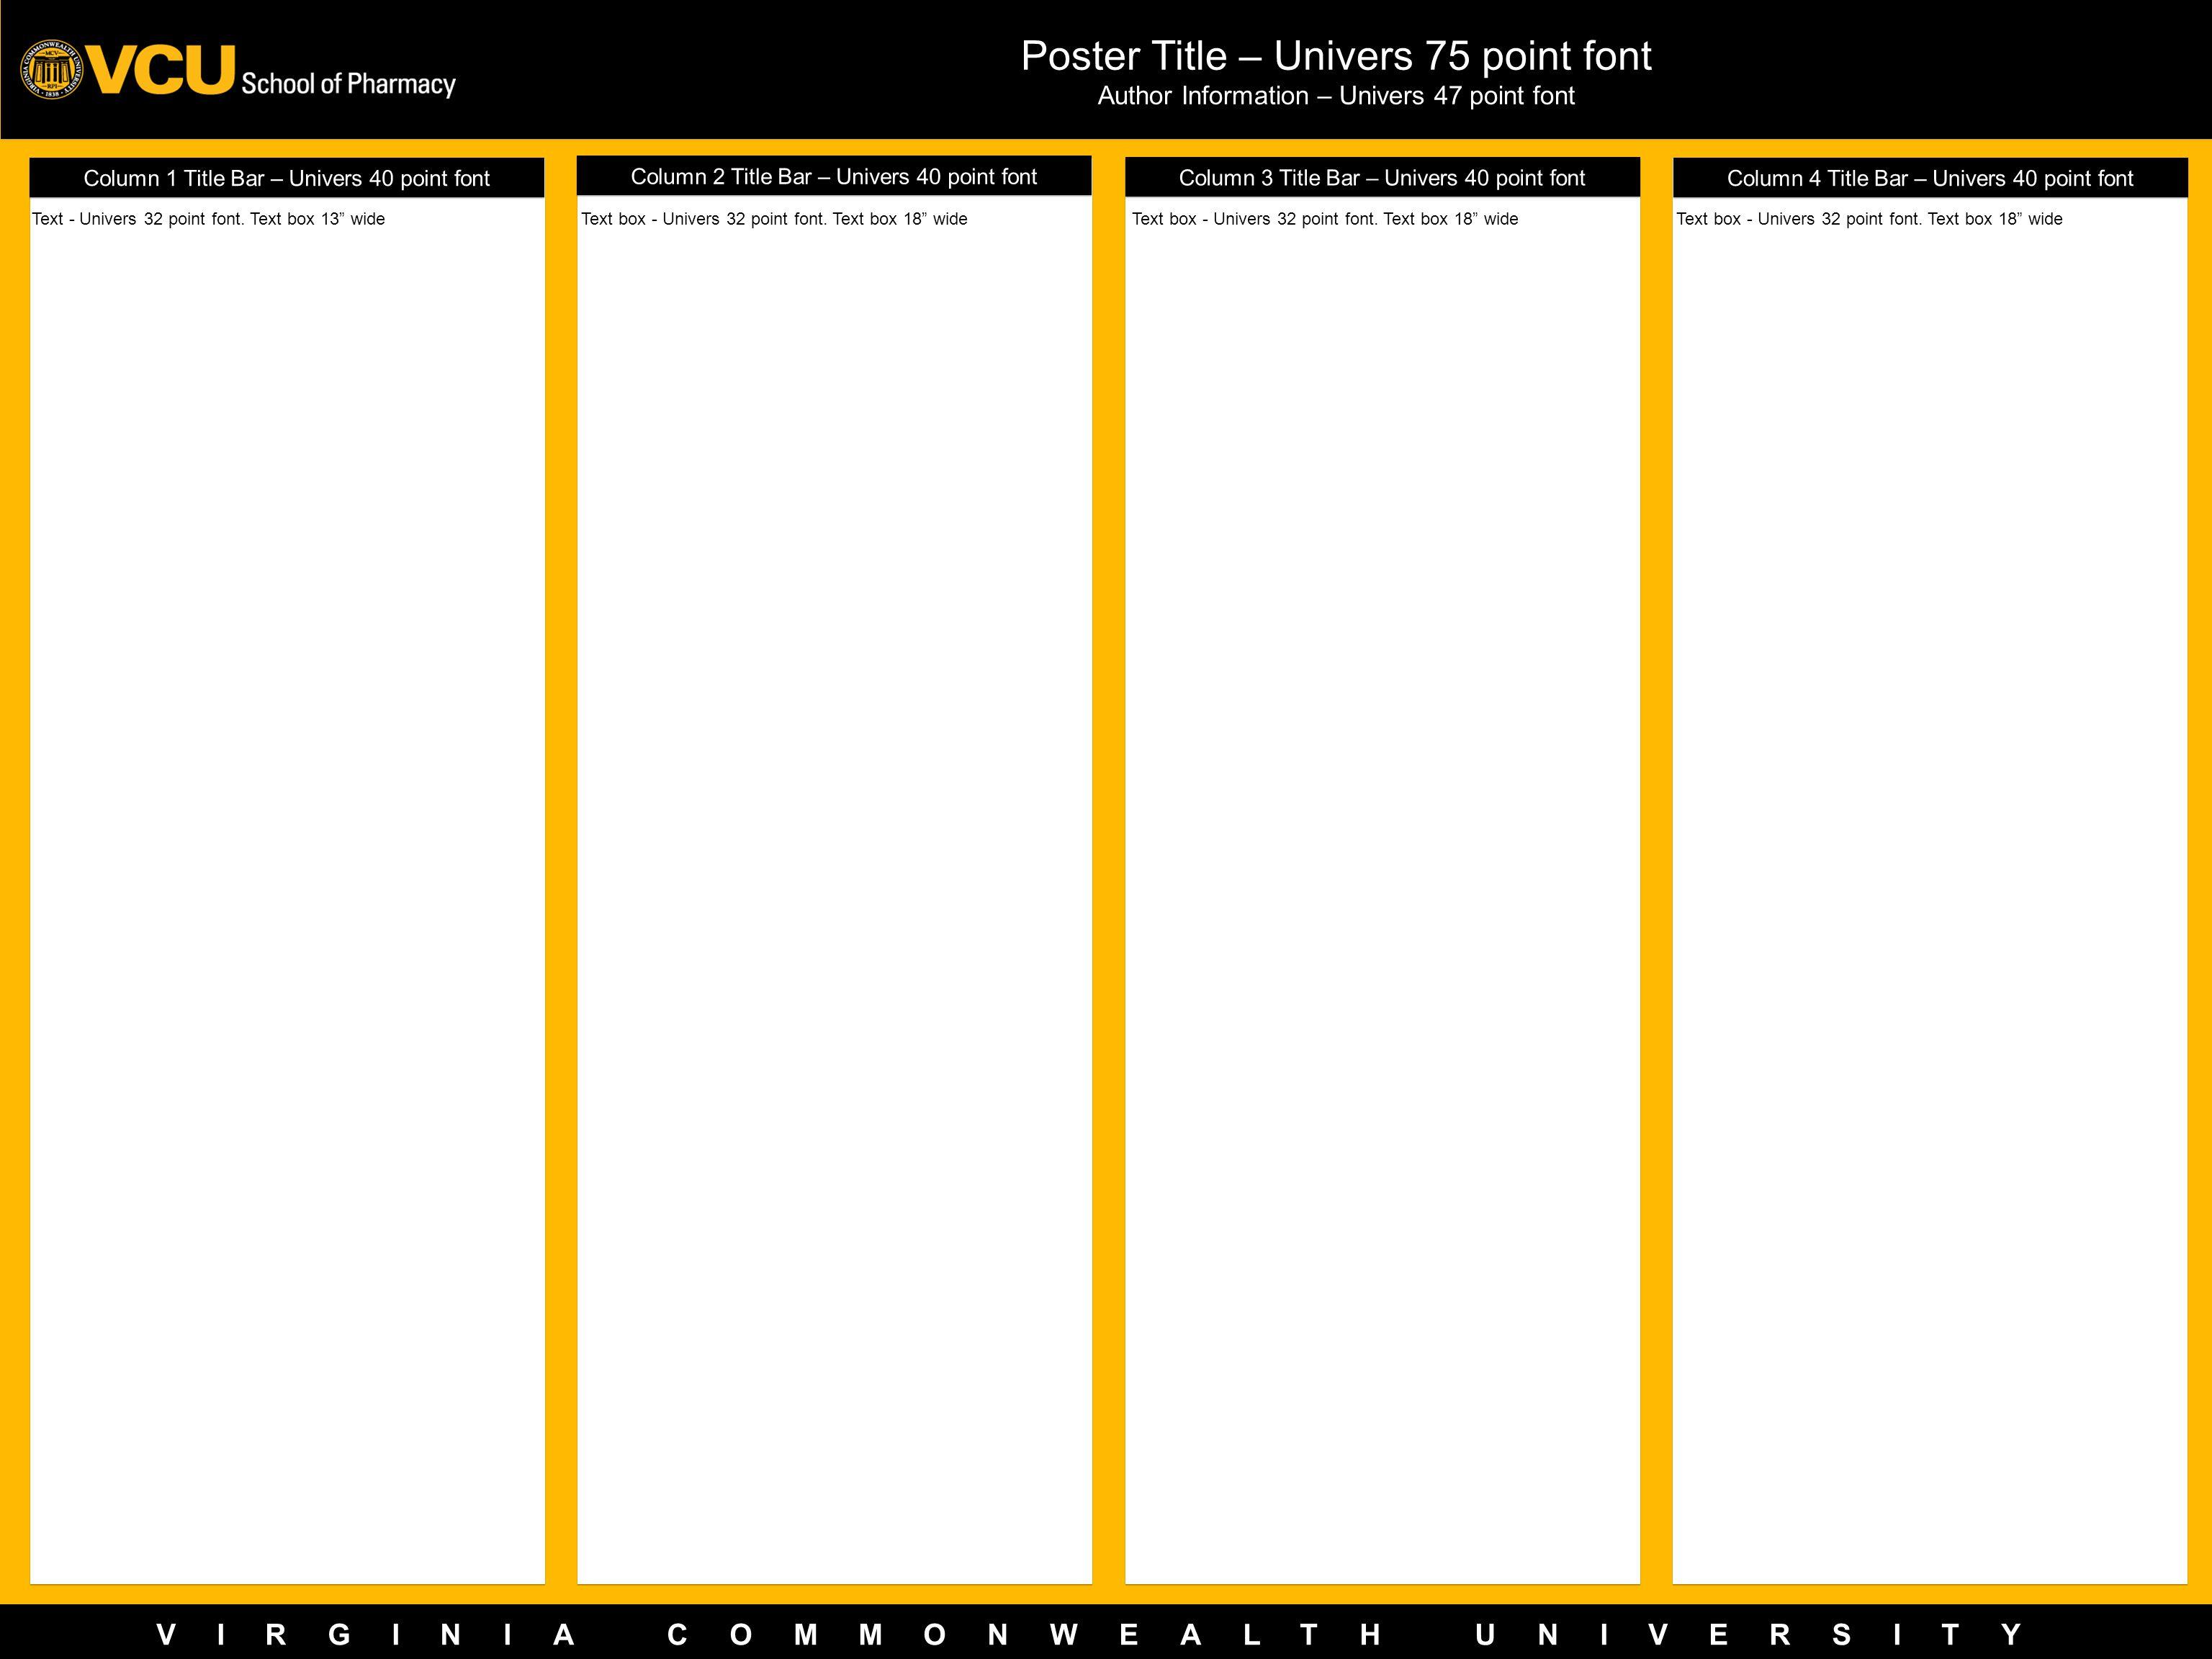 VIRGINIA COMMONWEALTH UNIVERSITY Column 1 Title Bar – Univers 40 point font Poster Title – Univers 75 point font Author Information – Univers 47 point